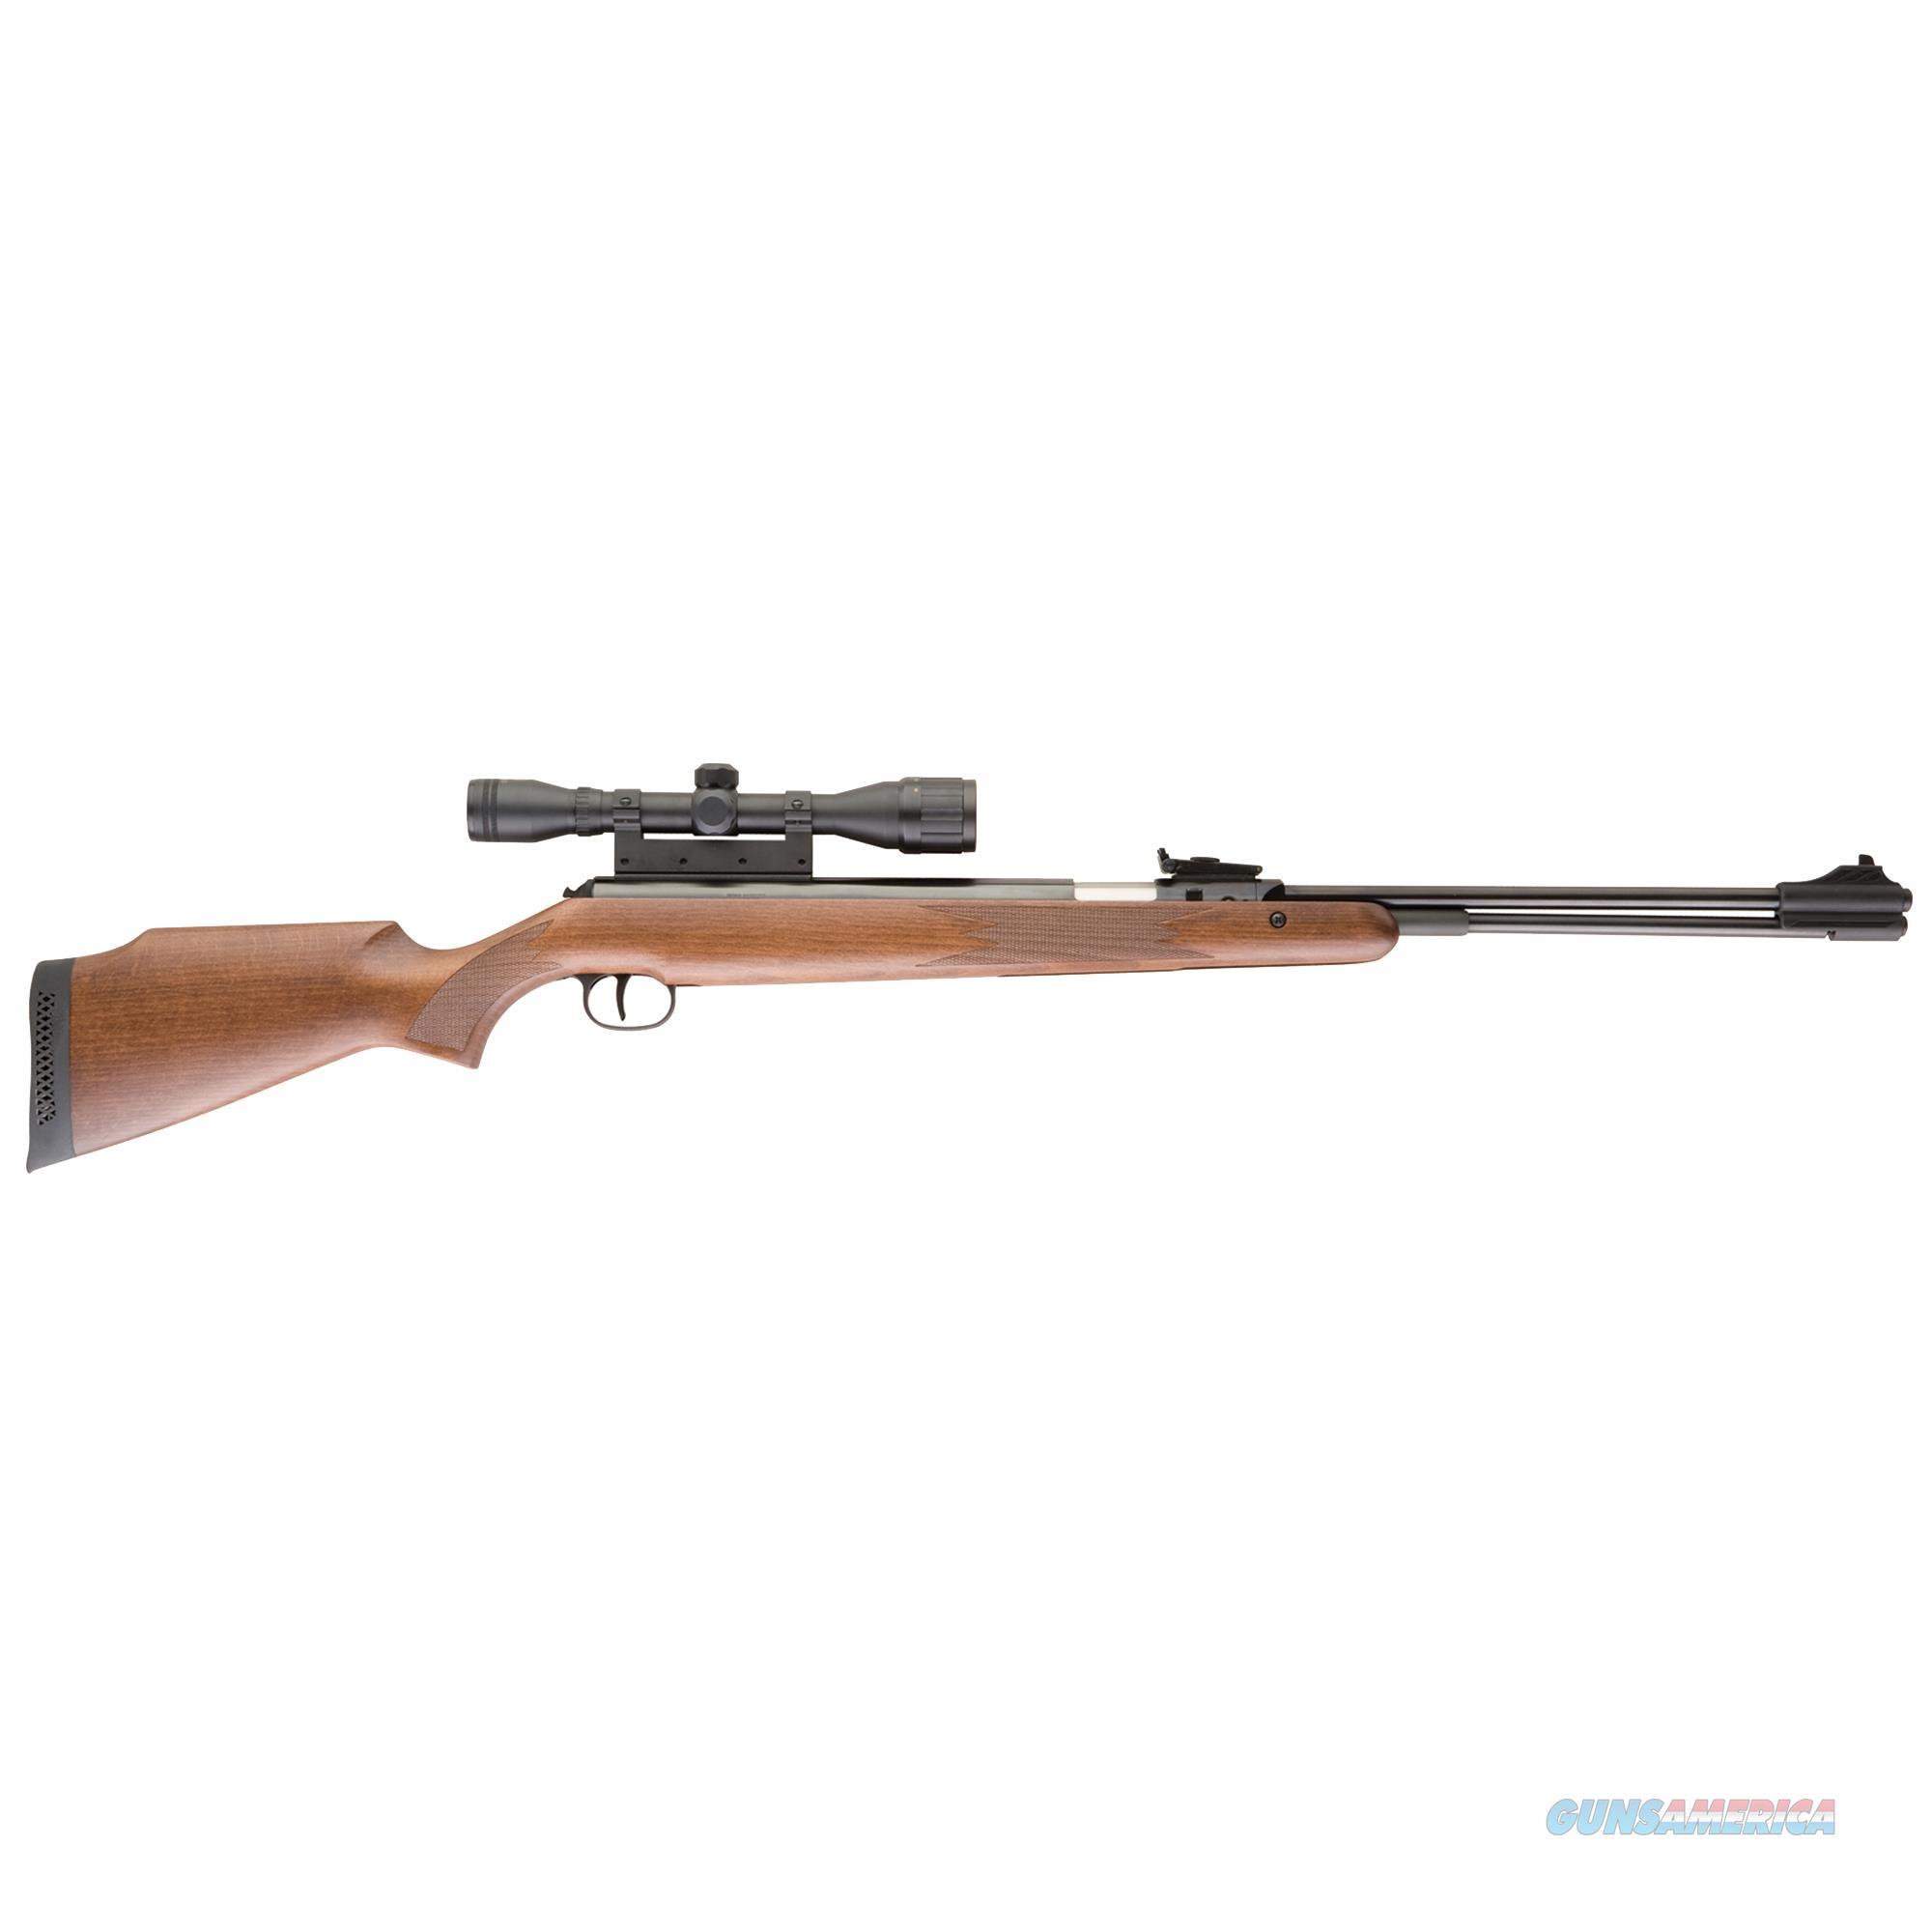 Rws Model 460 2166446  Non-Guns > Fishing/Spearfishing